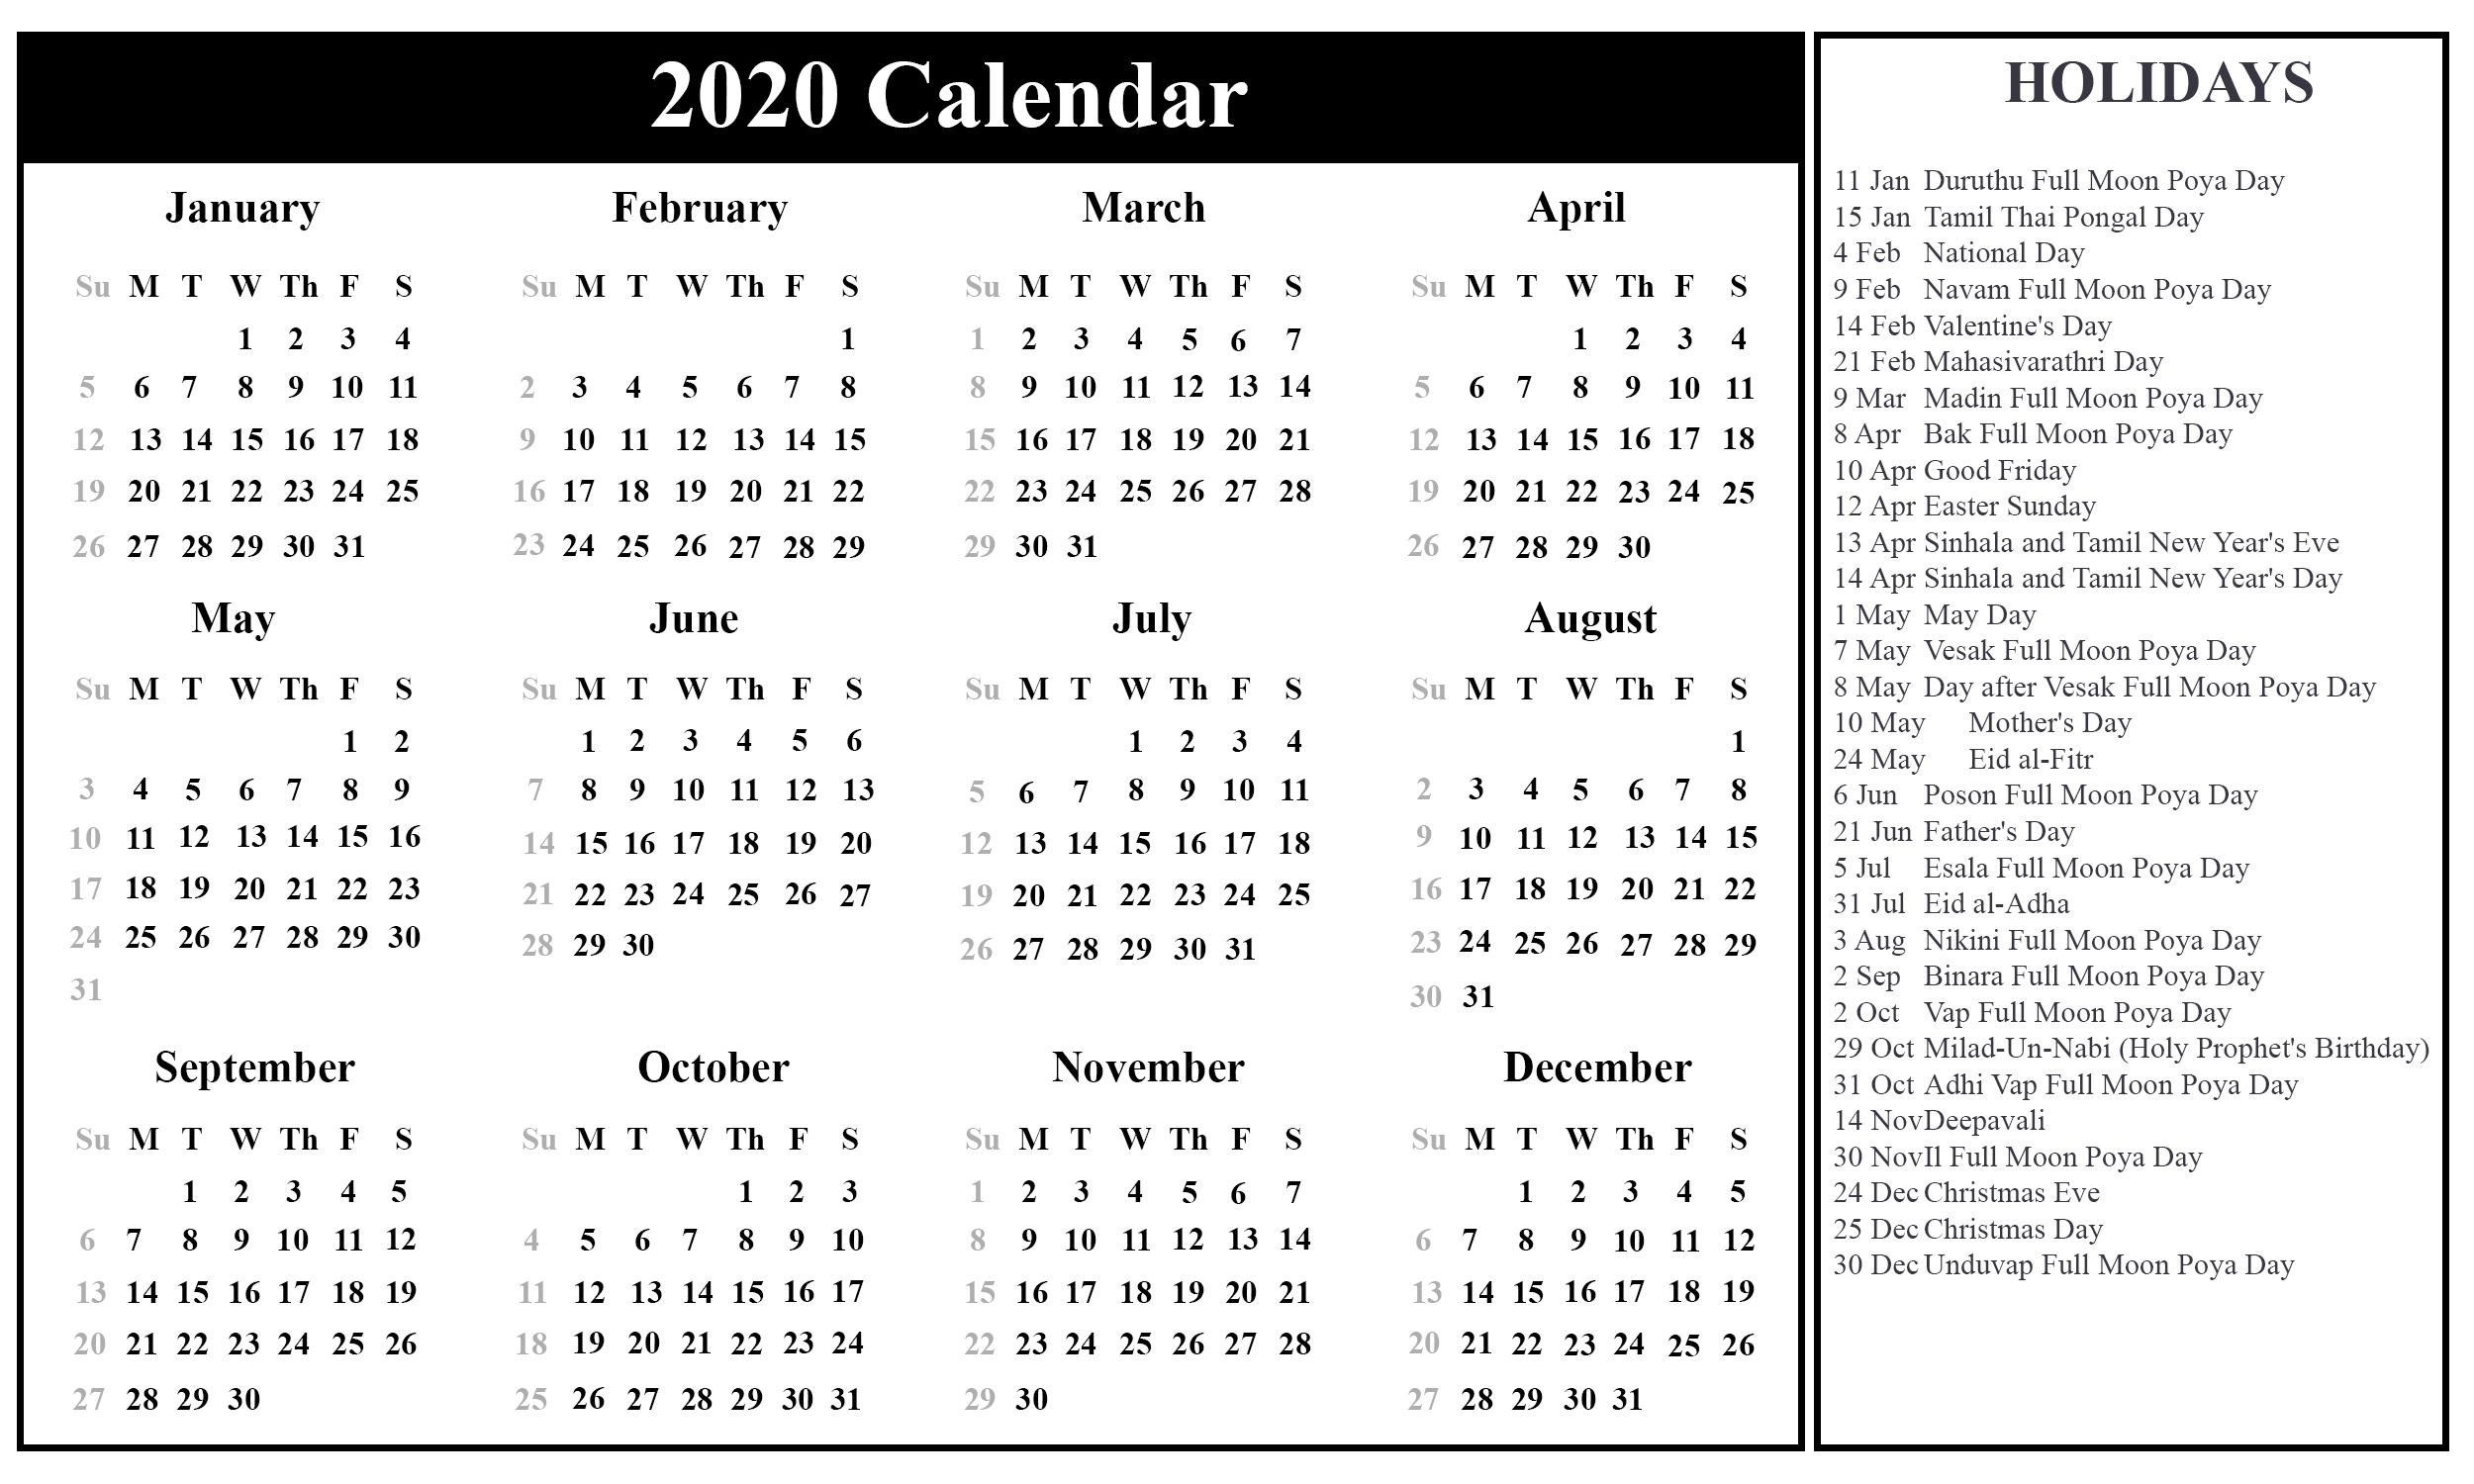 Free Printable Sri Lanka Calendar 2020 With Holidays In Pdf-January 2020 Calendar Urdu